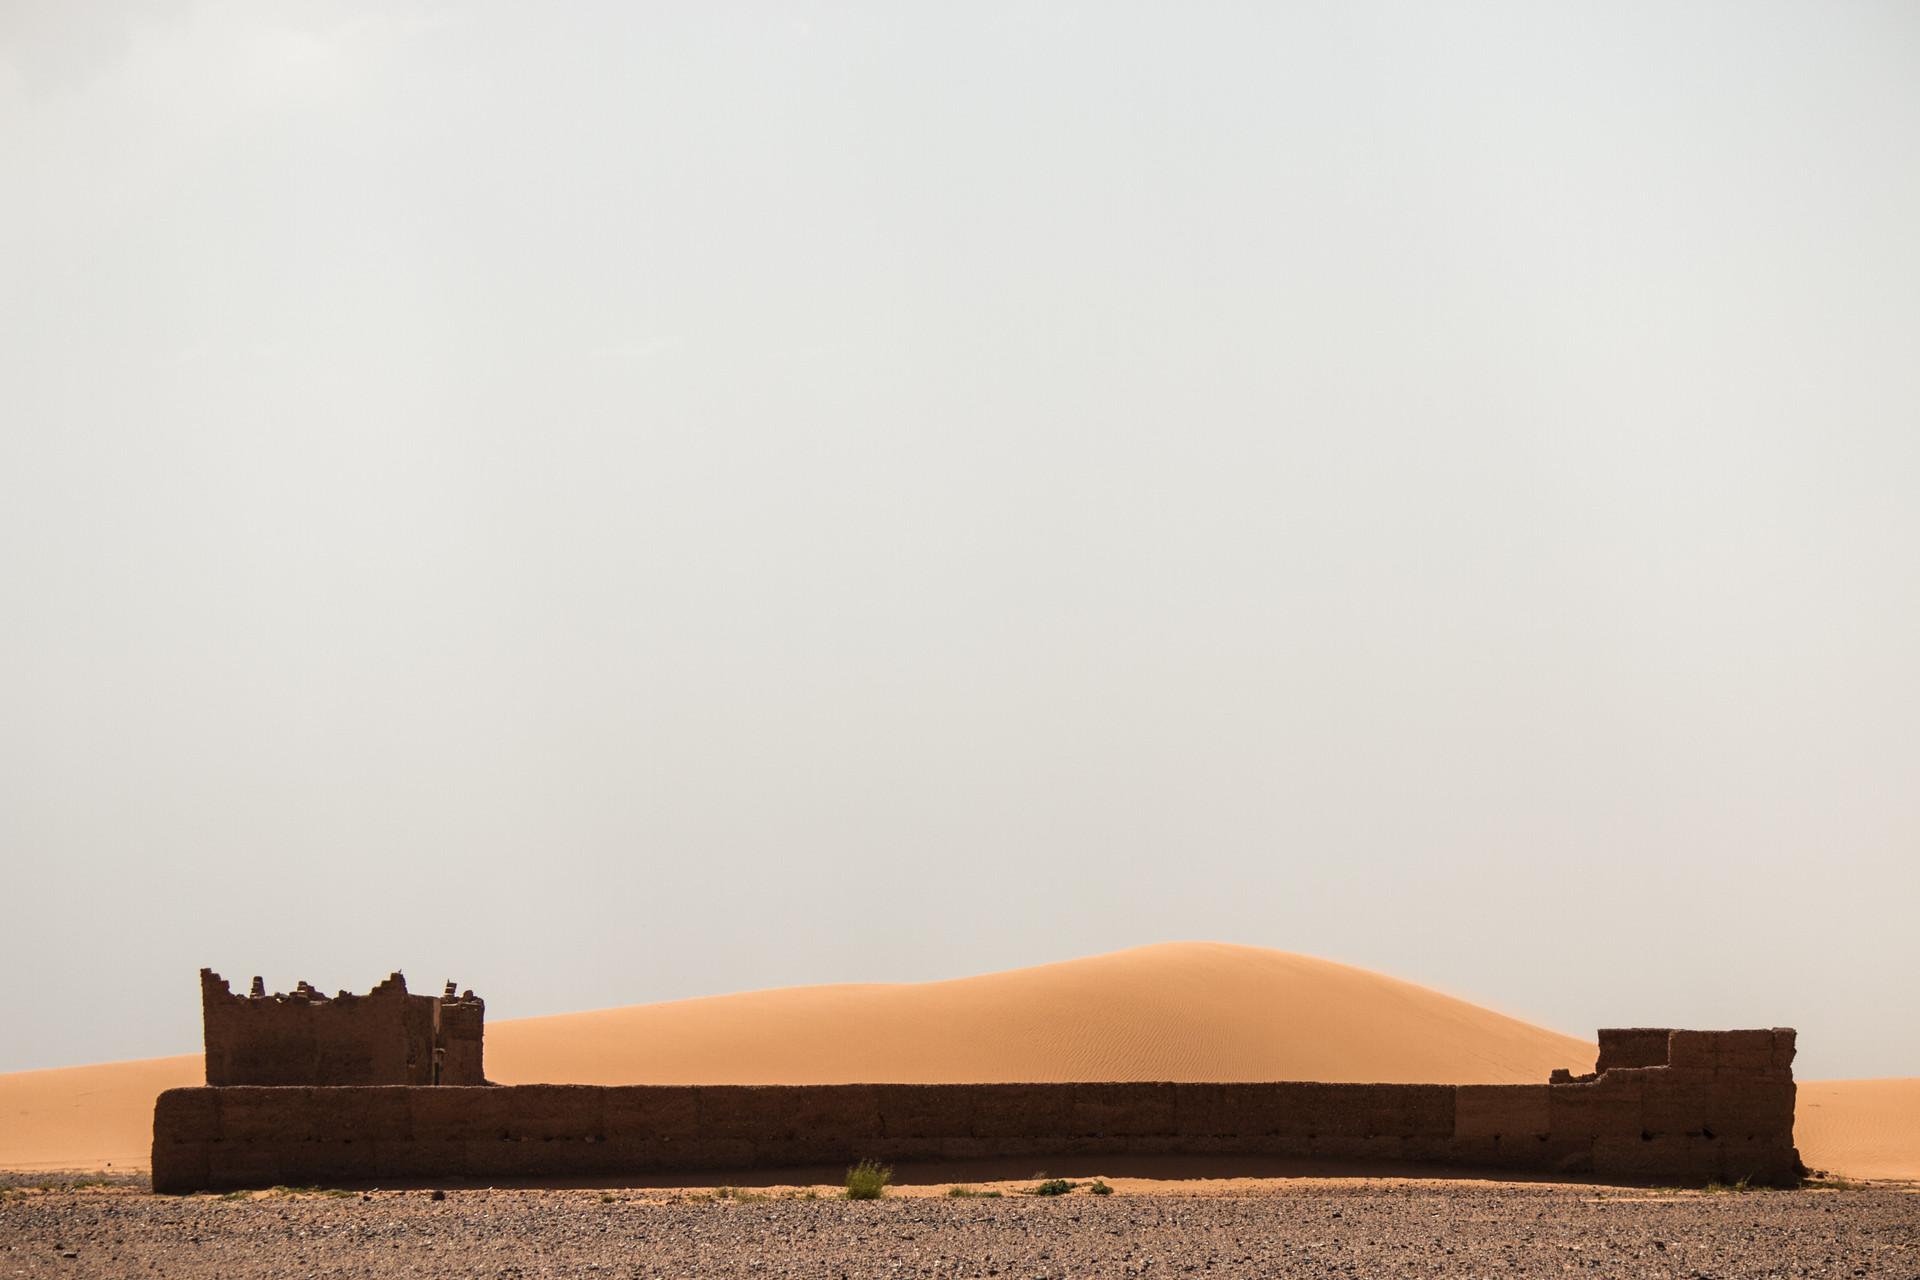 dune freighter